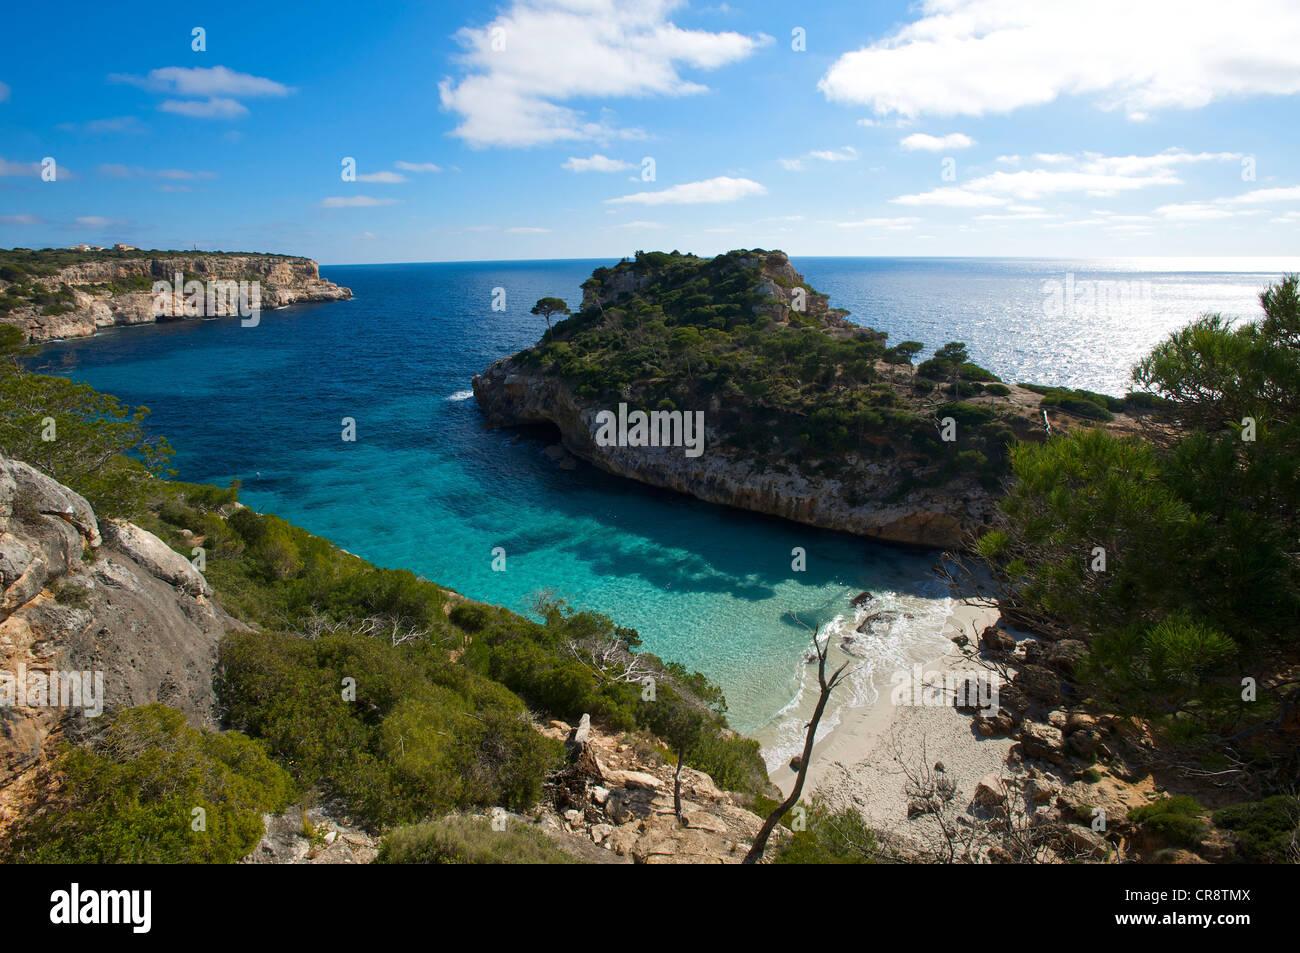 Cala S'Amonia, Majorque, Îles Baléares, Espagne, Europe Photo Stock